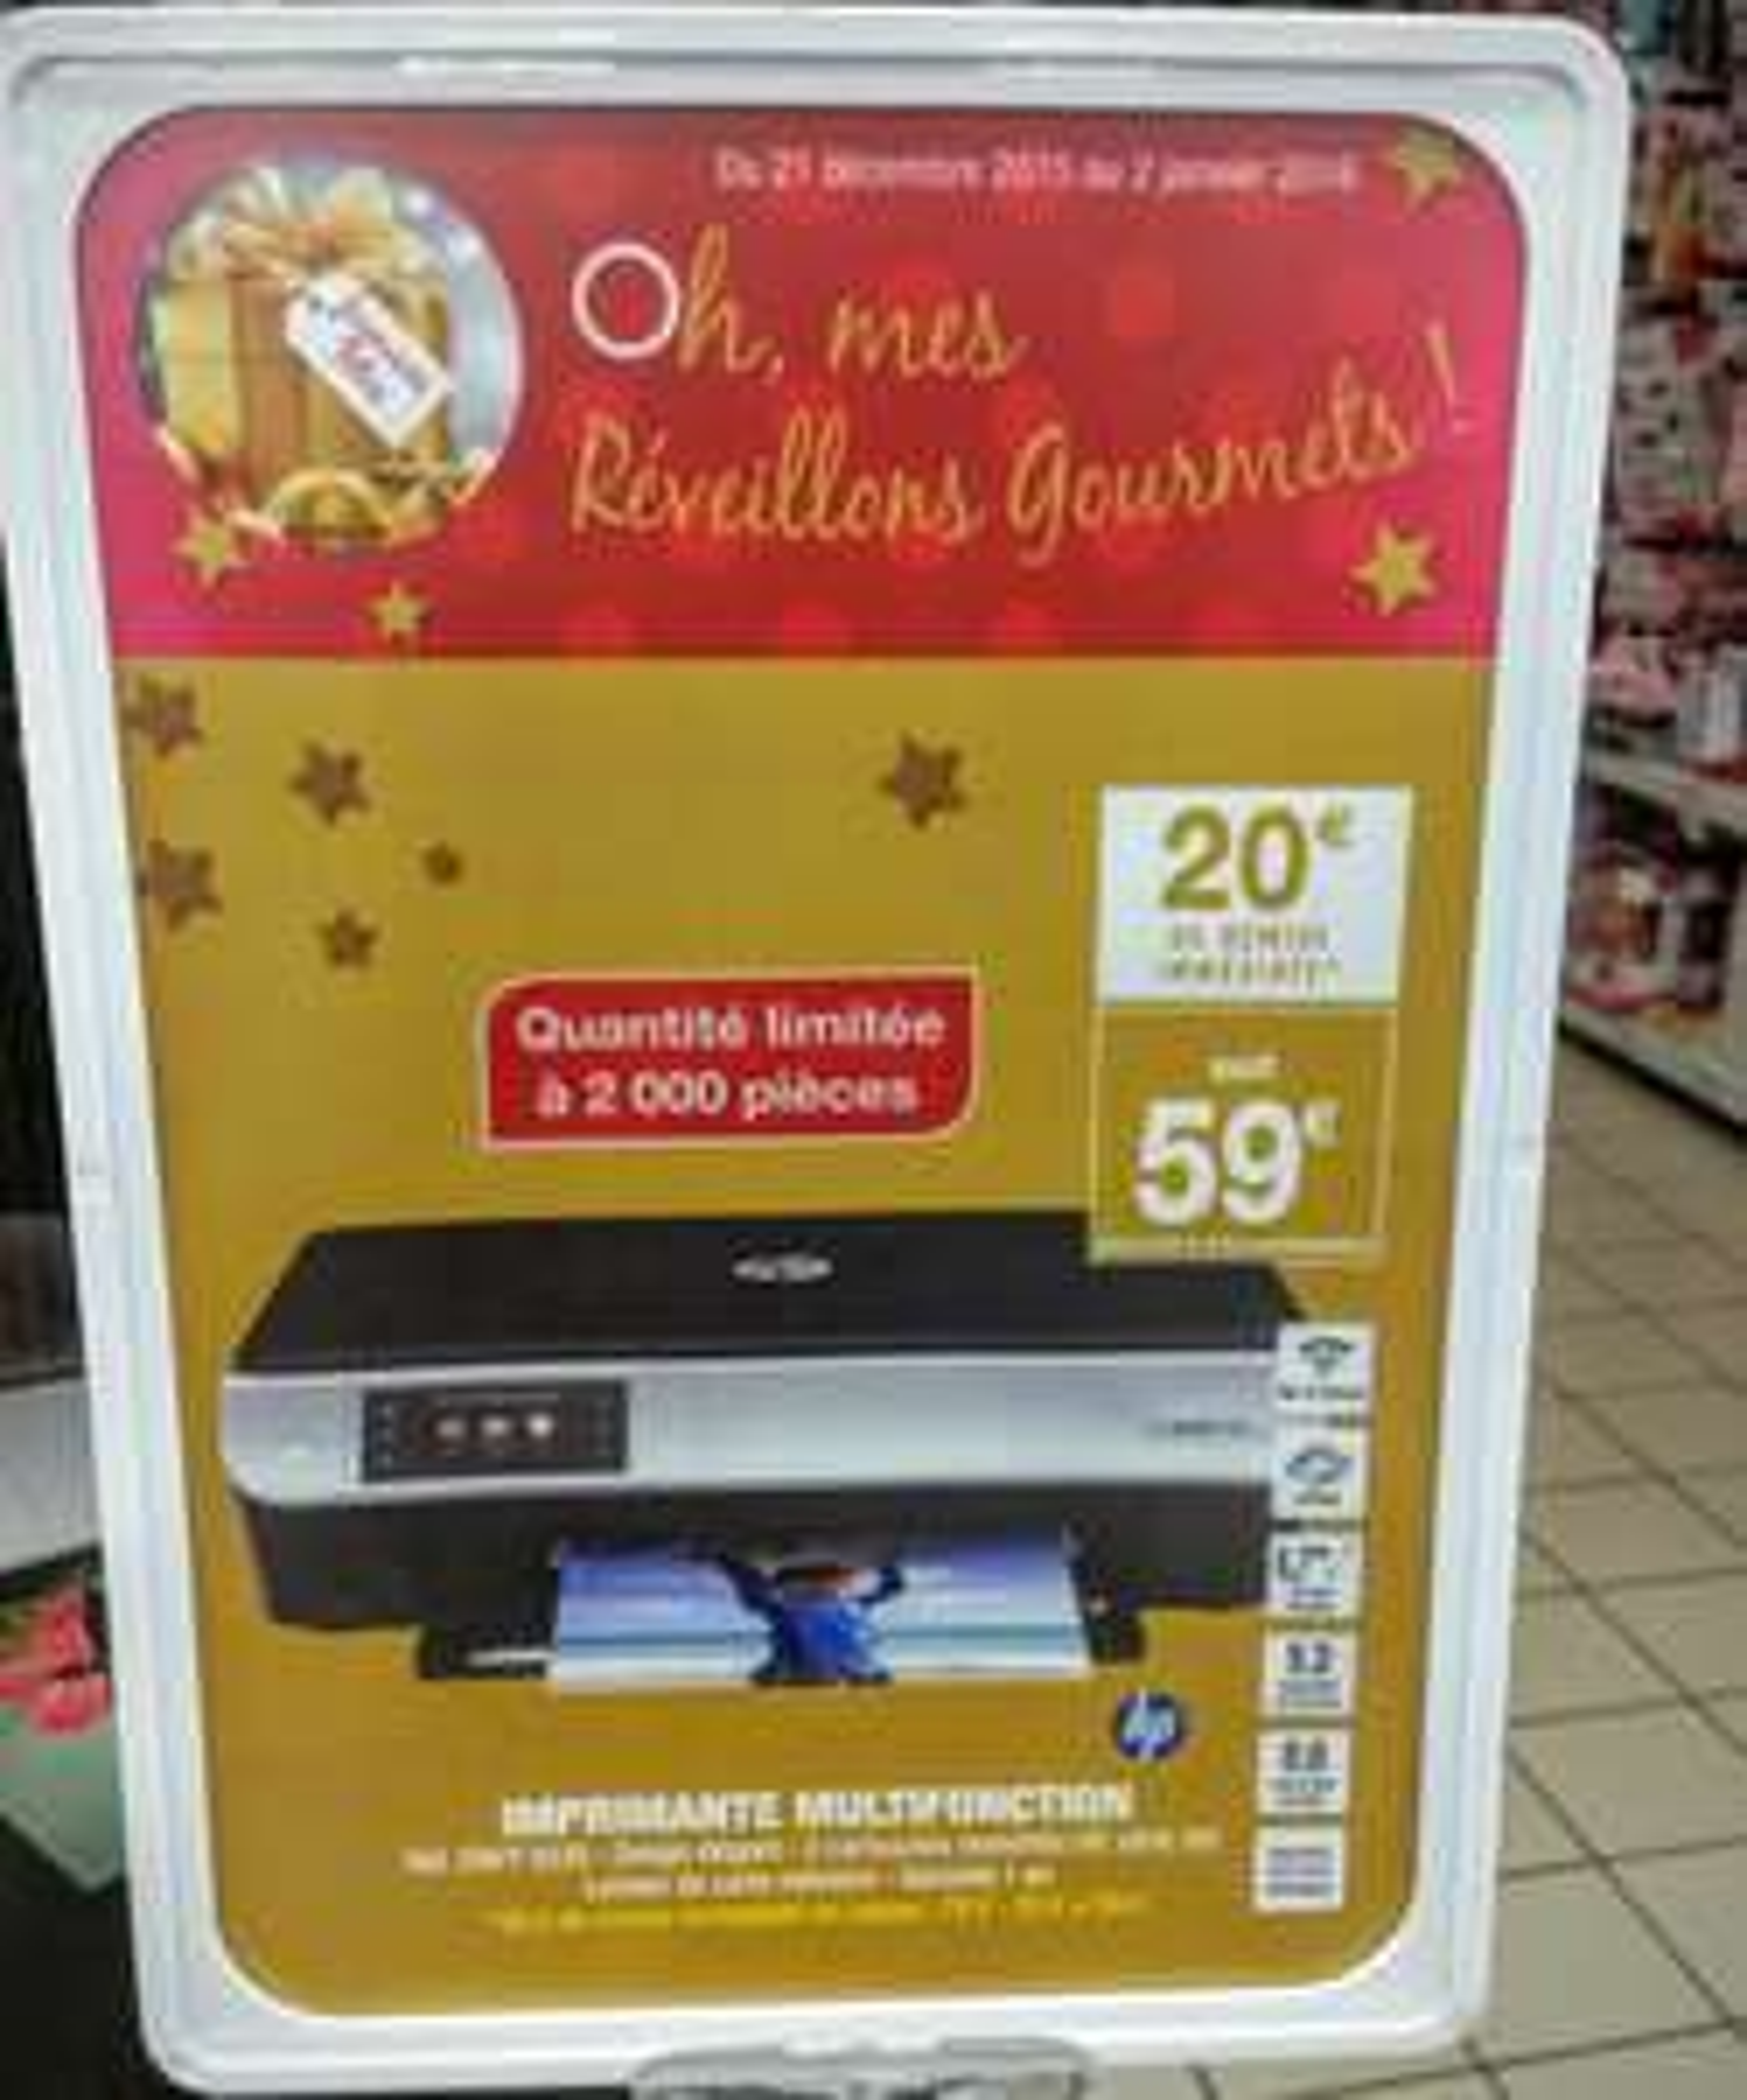 Imprimante multifonction HP Envy 5530